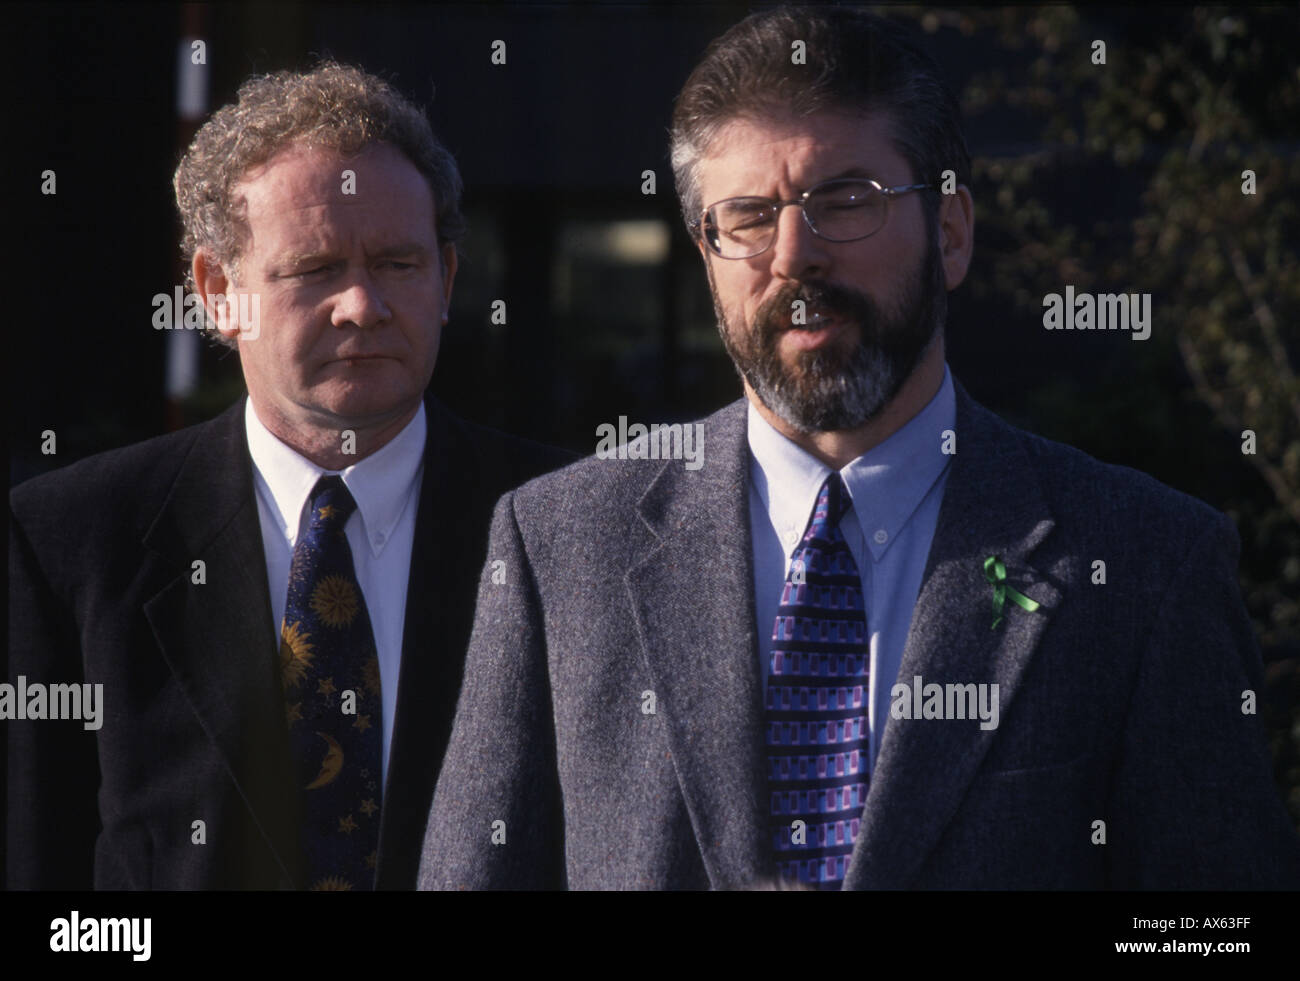 Gerry Adams Martin McGuinness in press conference,Belfast,N.Ireland, 05/ 07 /2004 - Stock Image